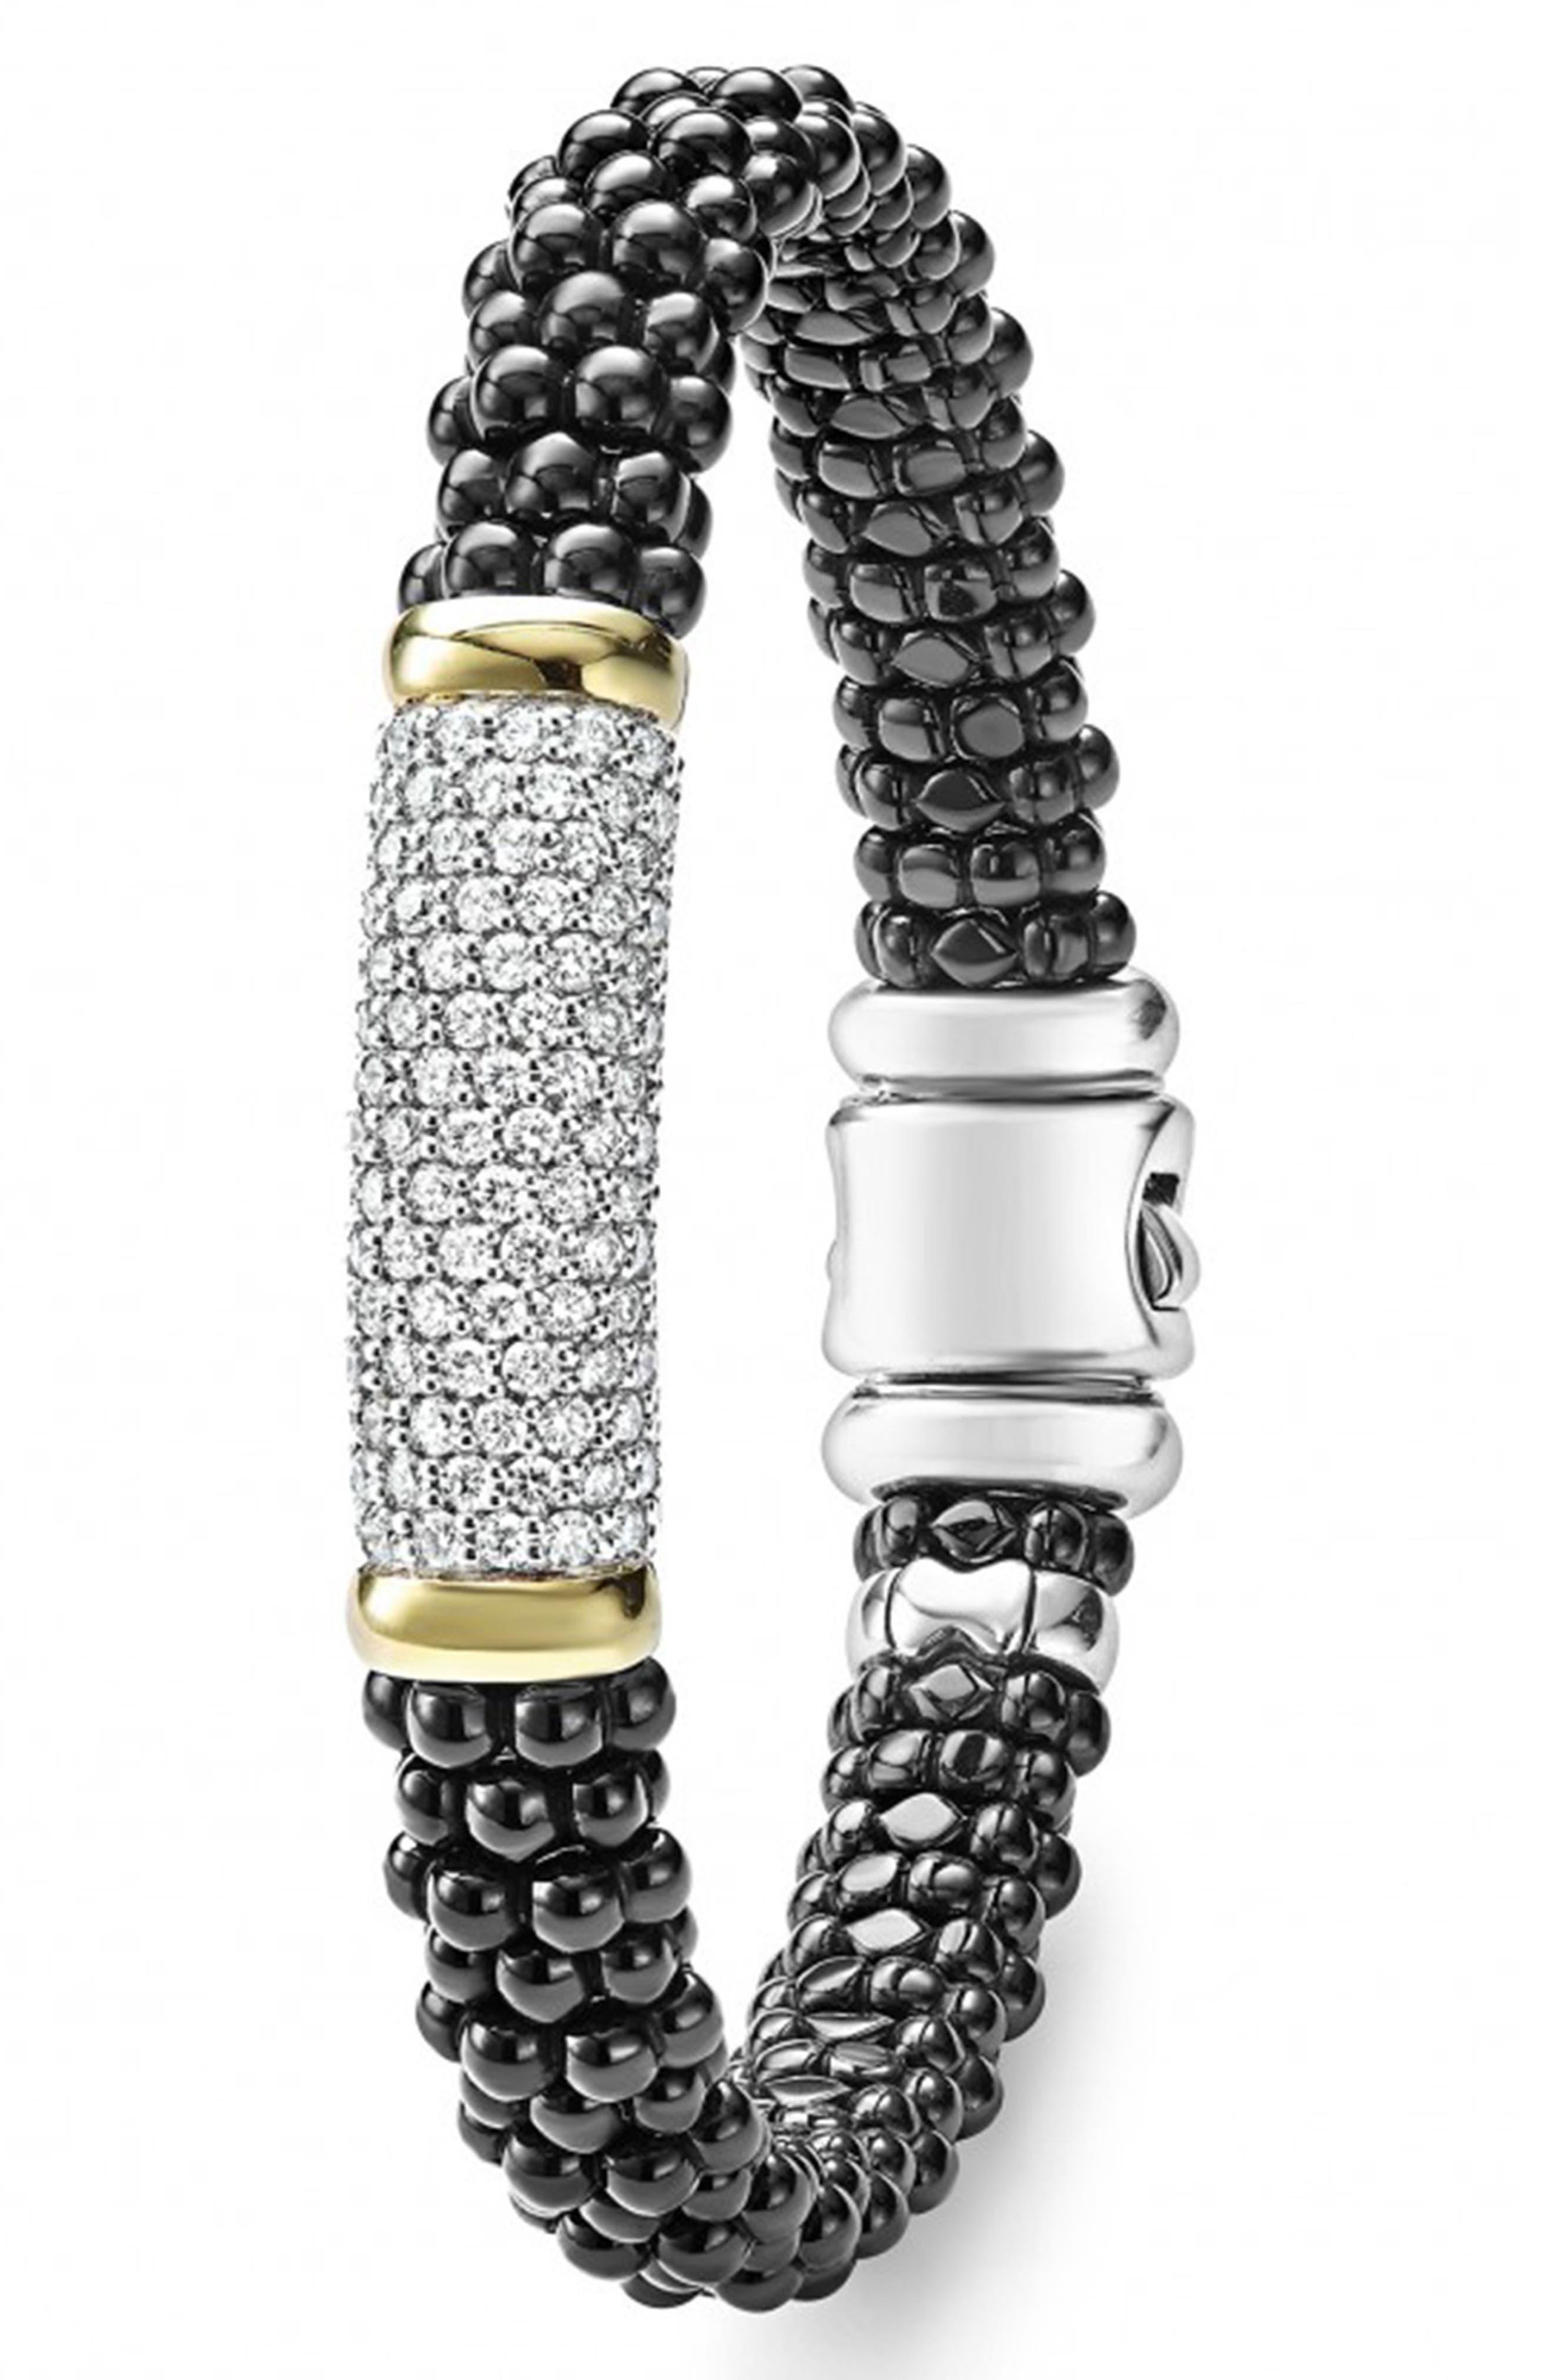 'Black Caviar' Diamond Rope Bracelet,                             Alternate thumbnail 2, color,                             Black Caviar/ Gold